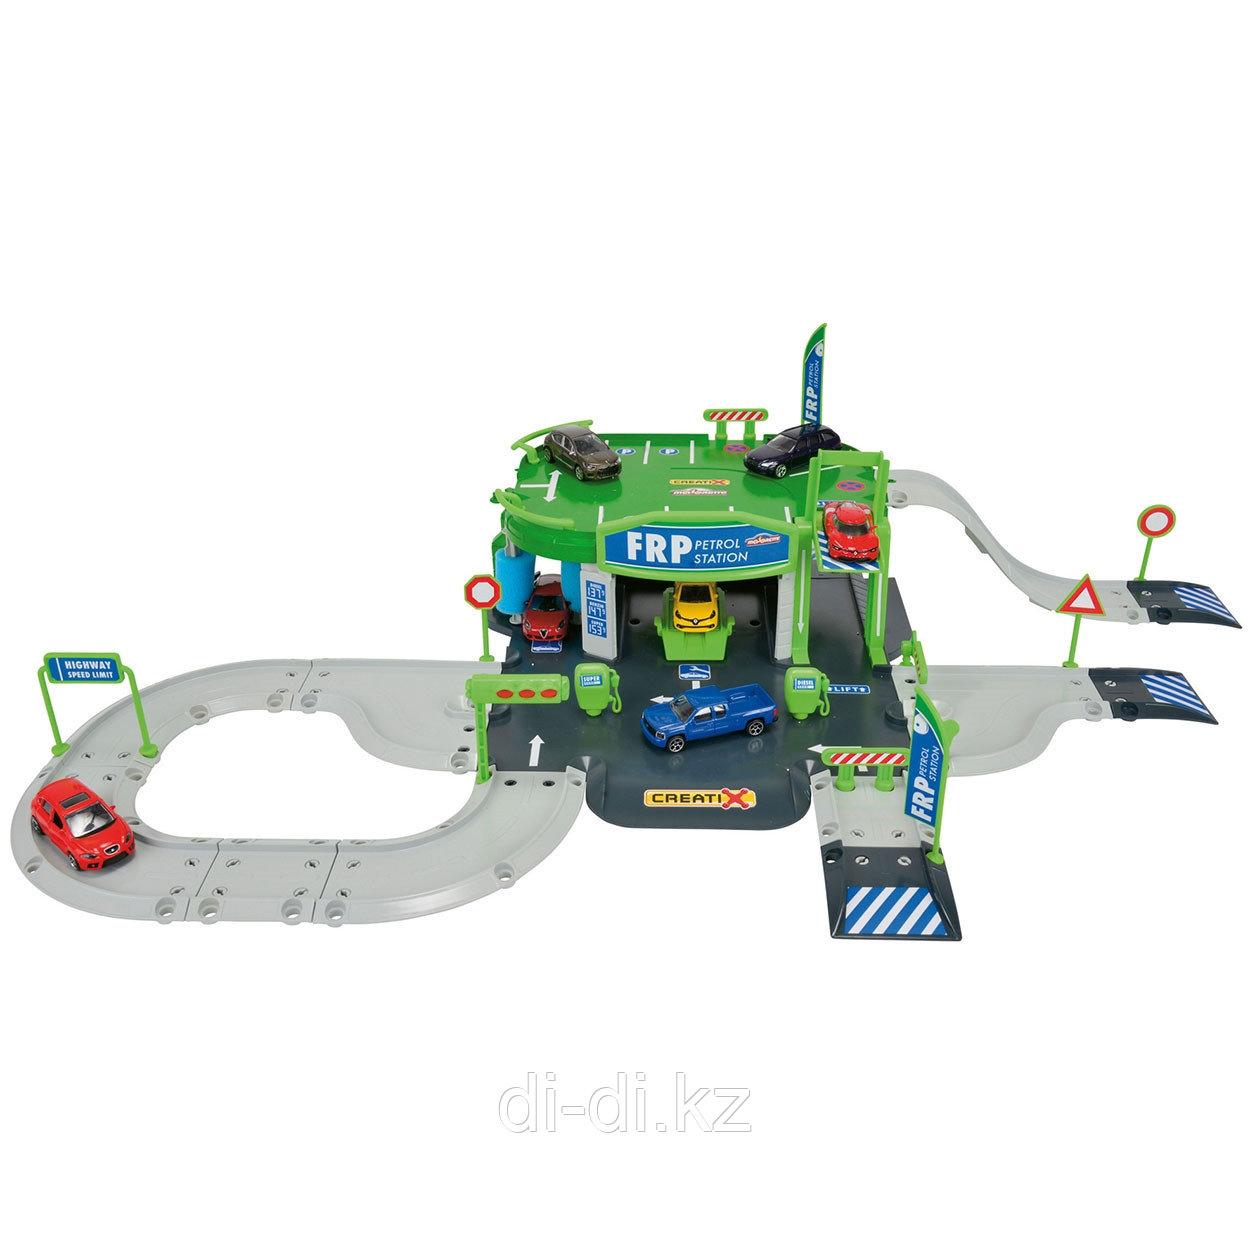 Dickie Toys Игровой набор Заправочная станция Creatix +  1 die-cast машинка Majorette 2050010